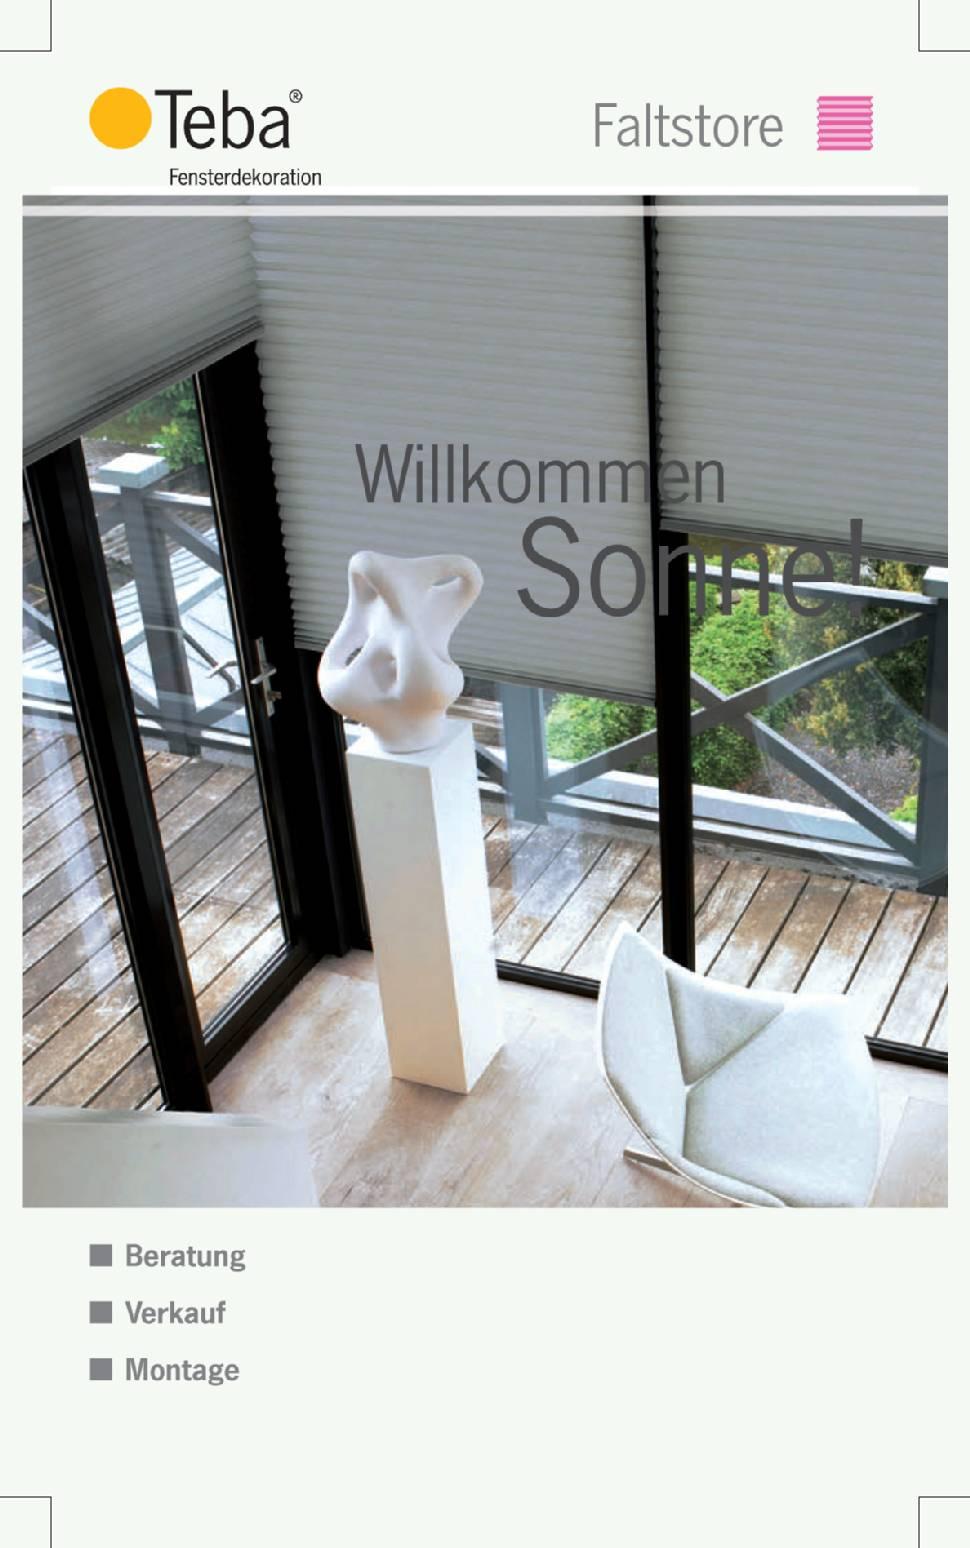 tuschhoff gmbh metallbau berdachungen insektenschutz. Black Bedroom Furniture Sets. Home Design Ideas